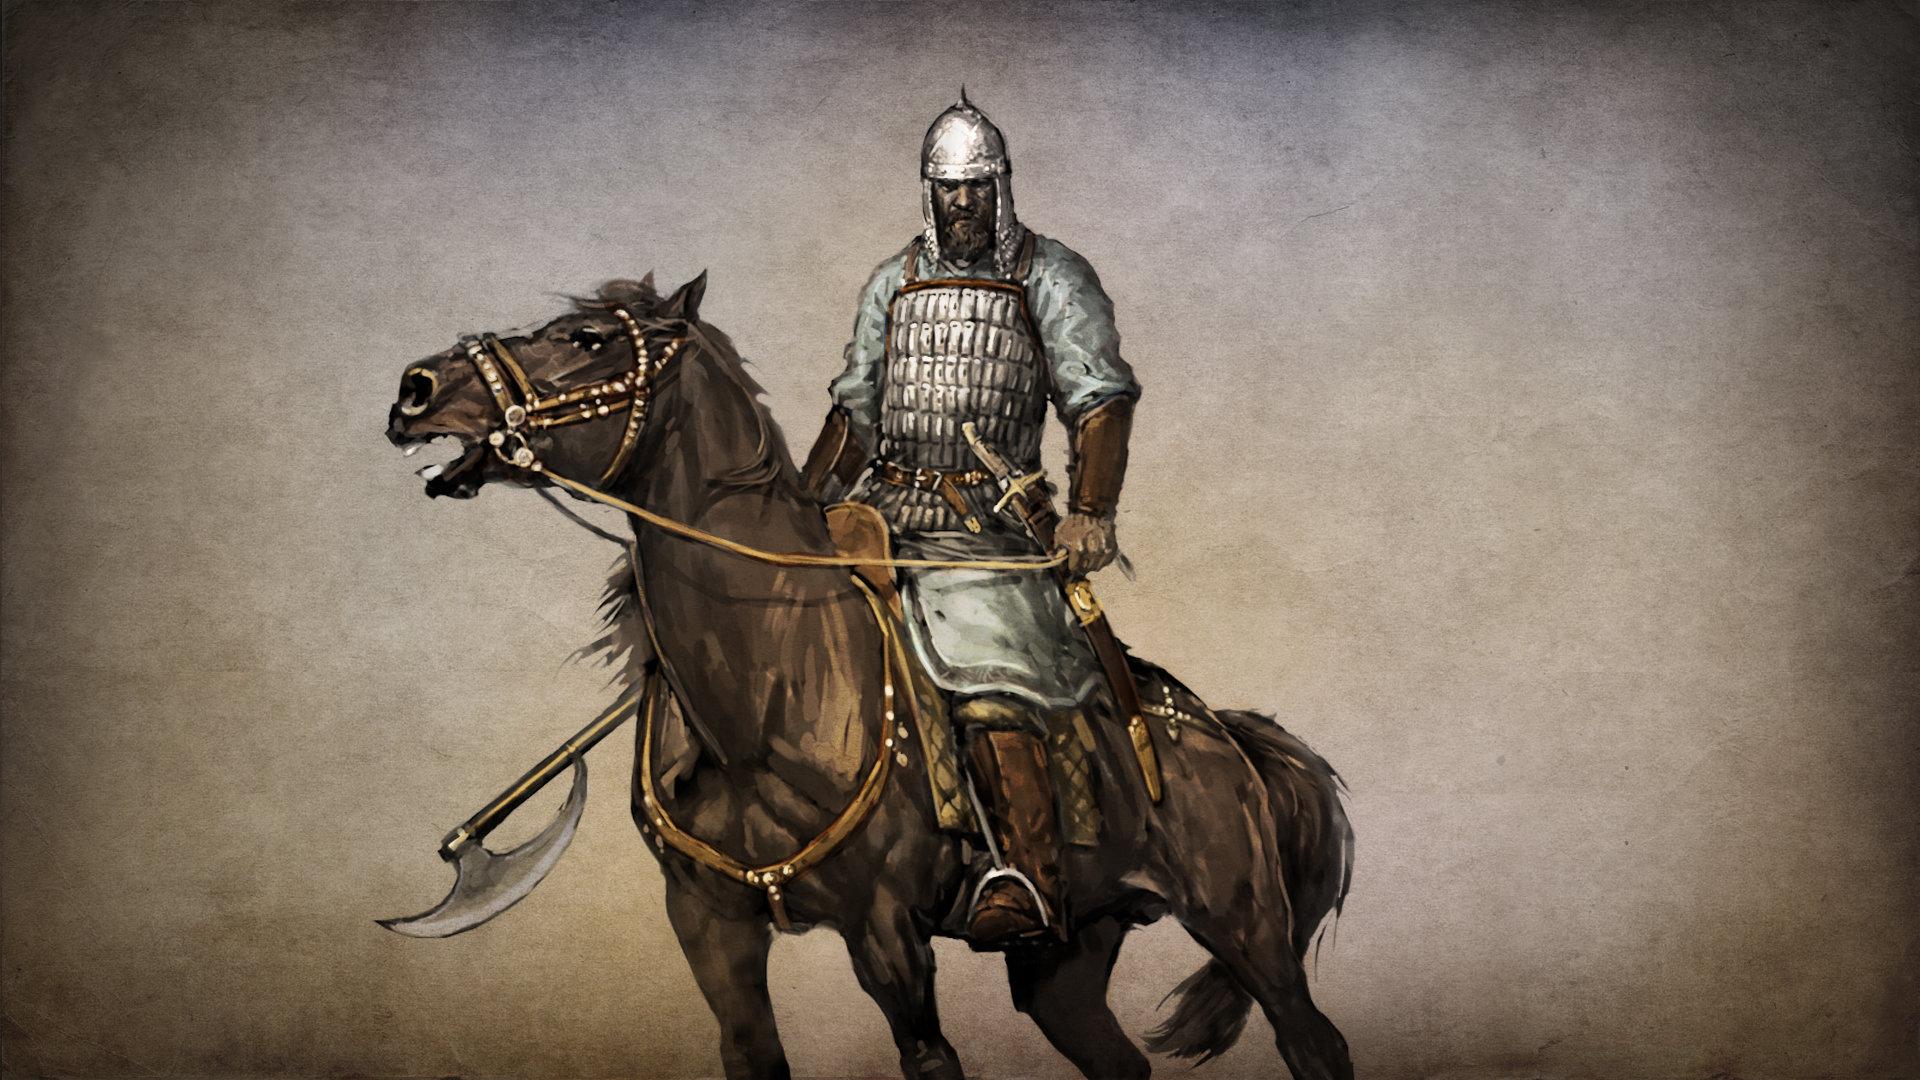 Mount Blade Wallpapers Hd For Desktop Backgrounds